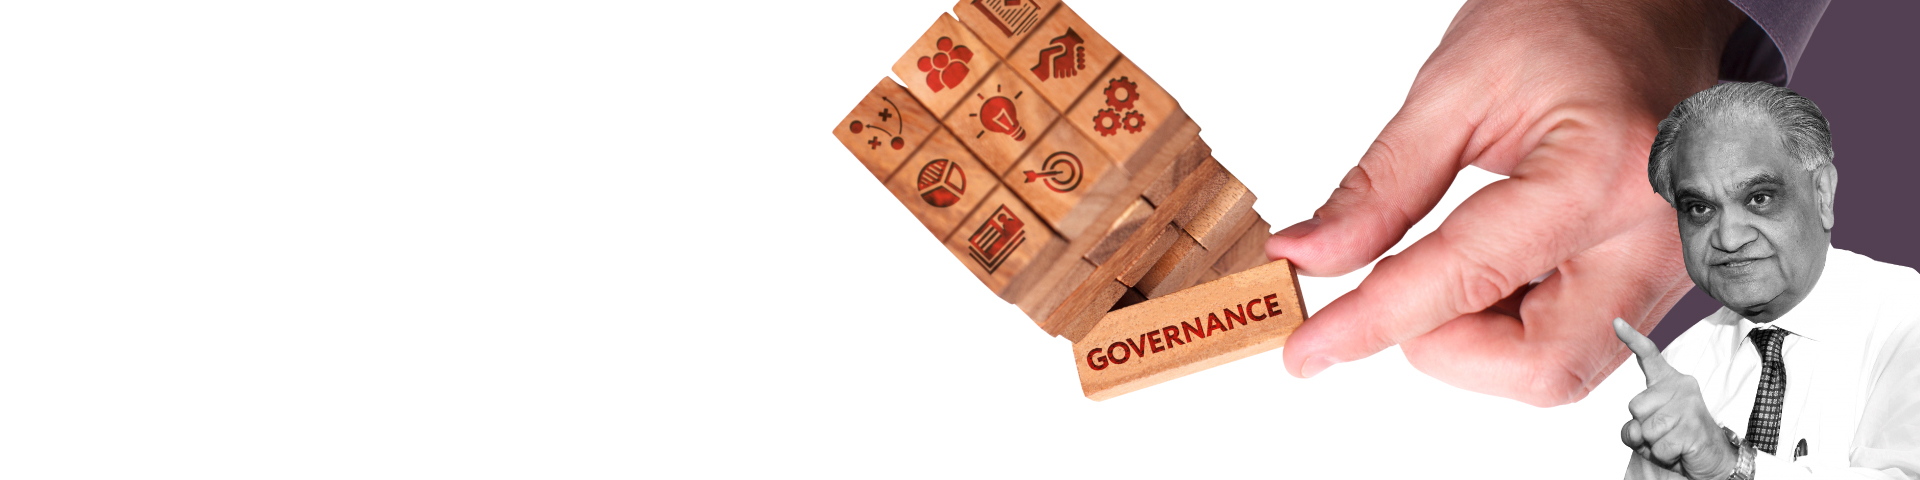 Measurable Corporate Governance